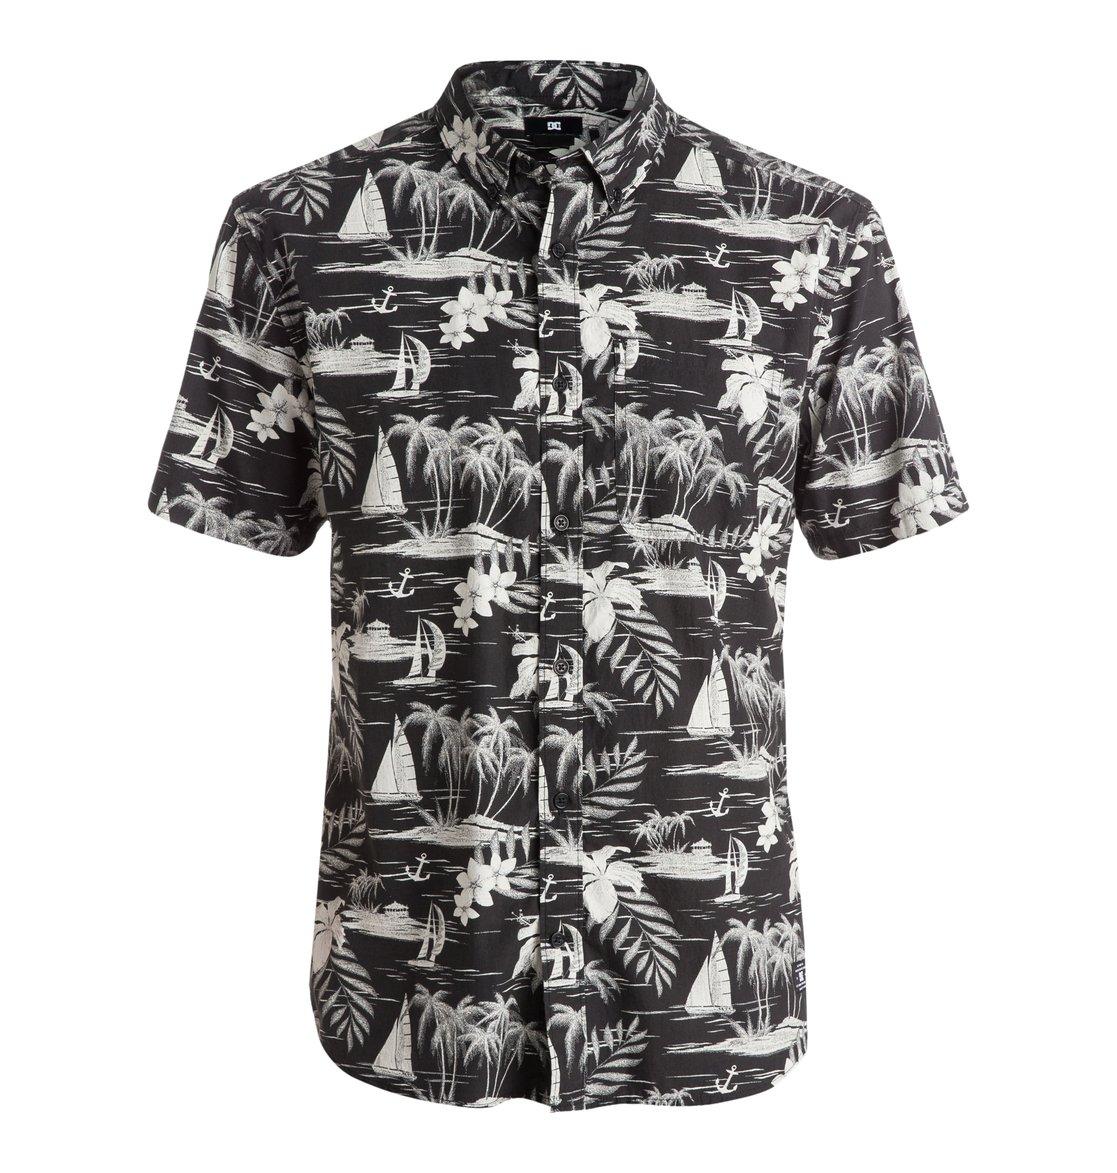 Vacation Short Sleeve Shirt. Производитель: Dcshoes, артикул: 3613371375911